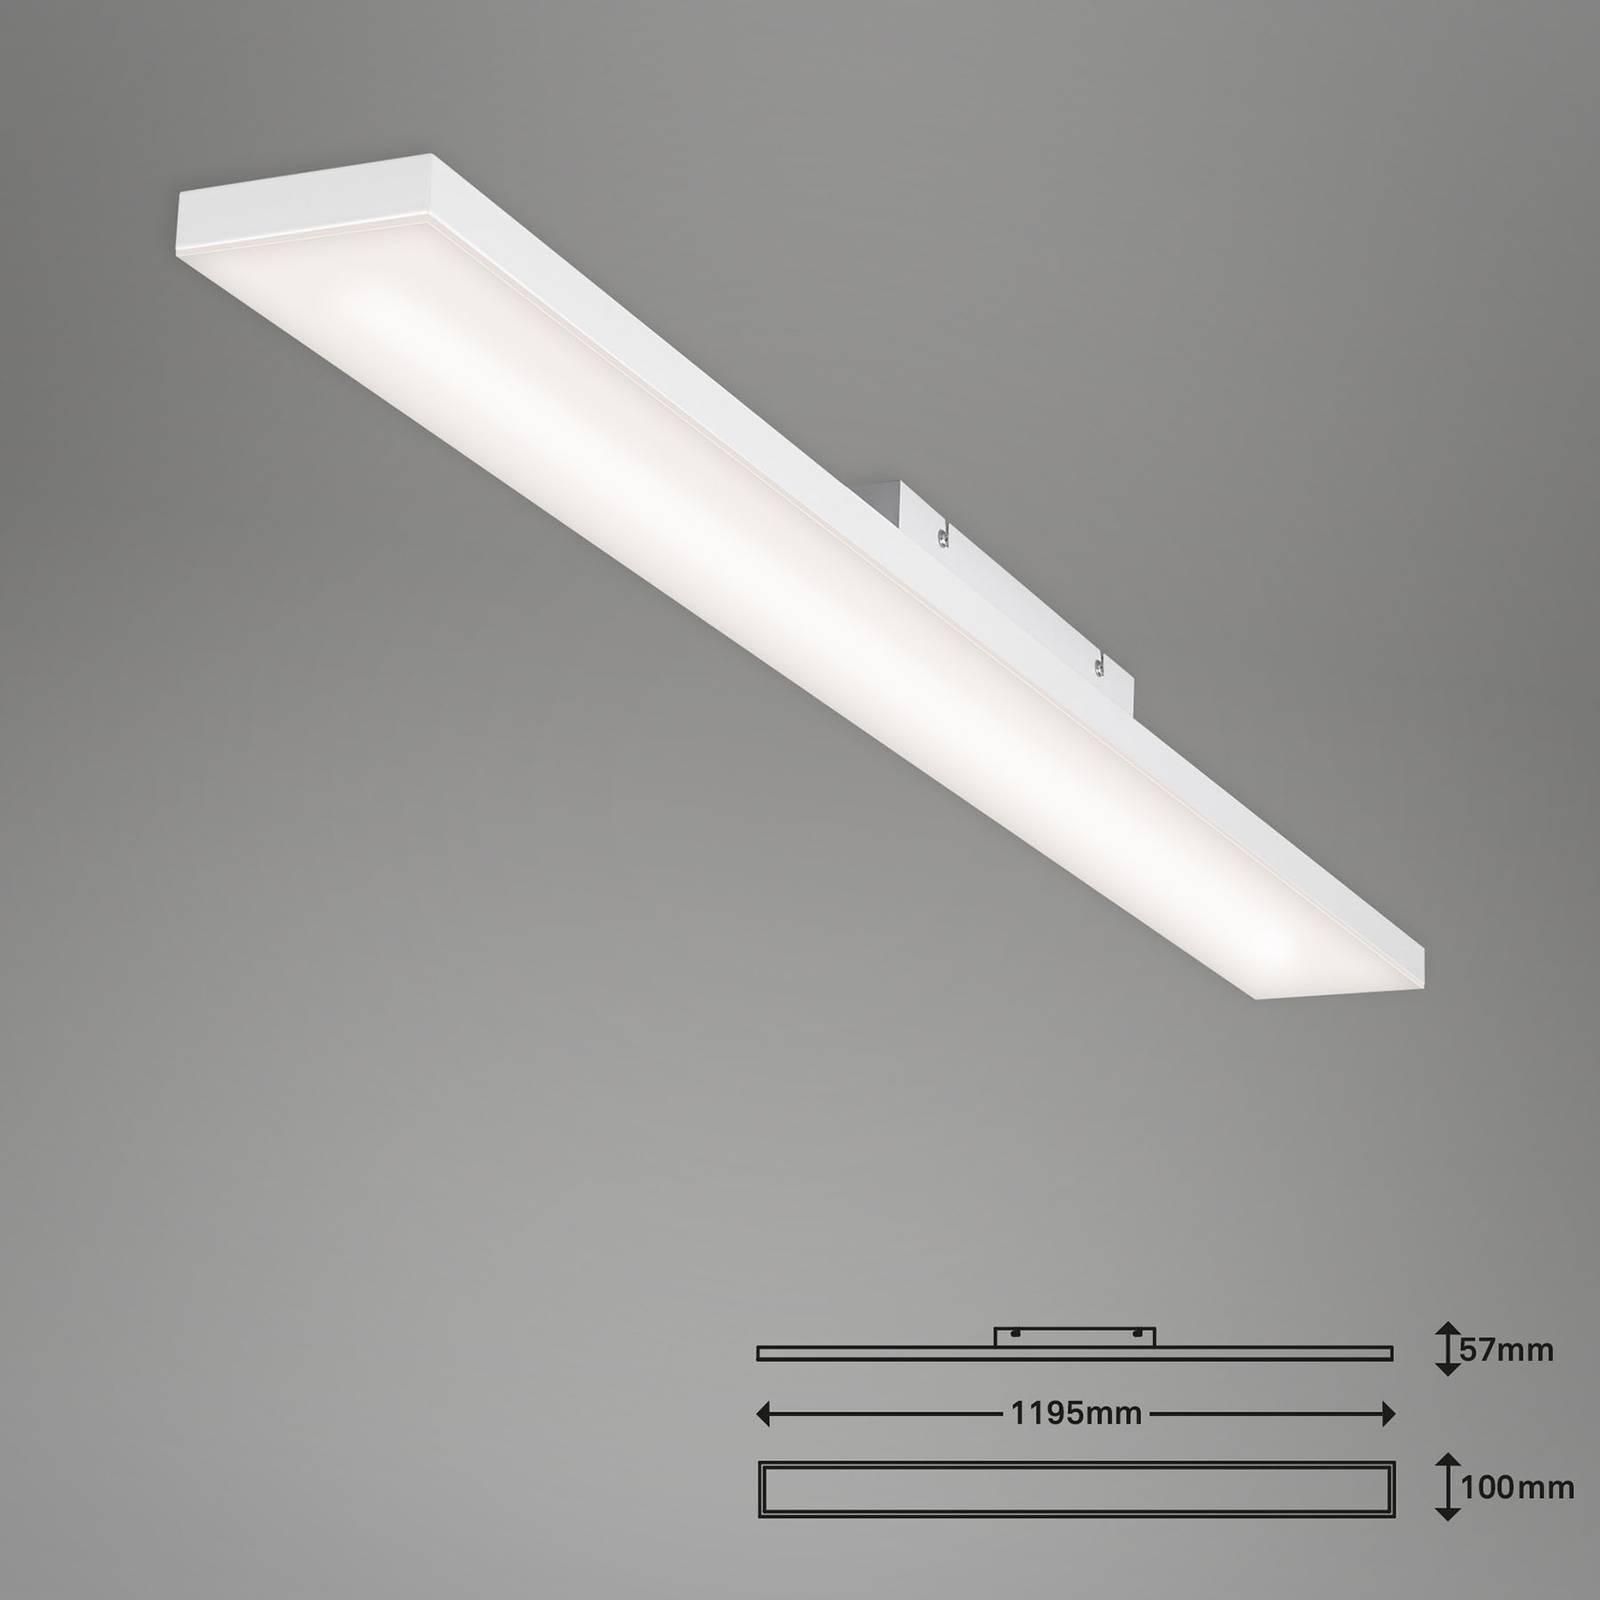 Lampa sufitowa LED Frameless RGBW, 120x10cm